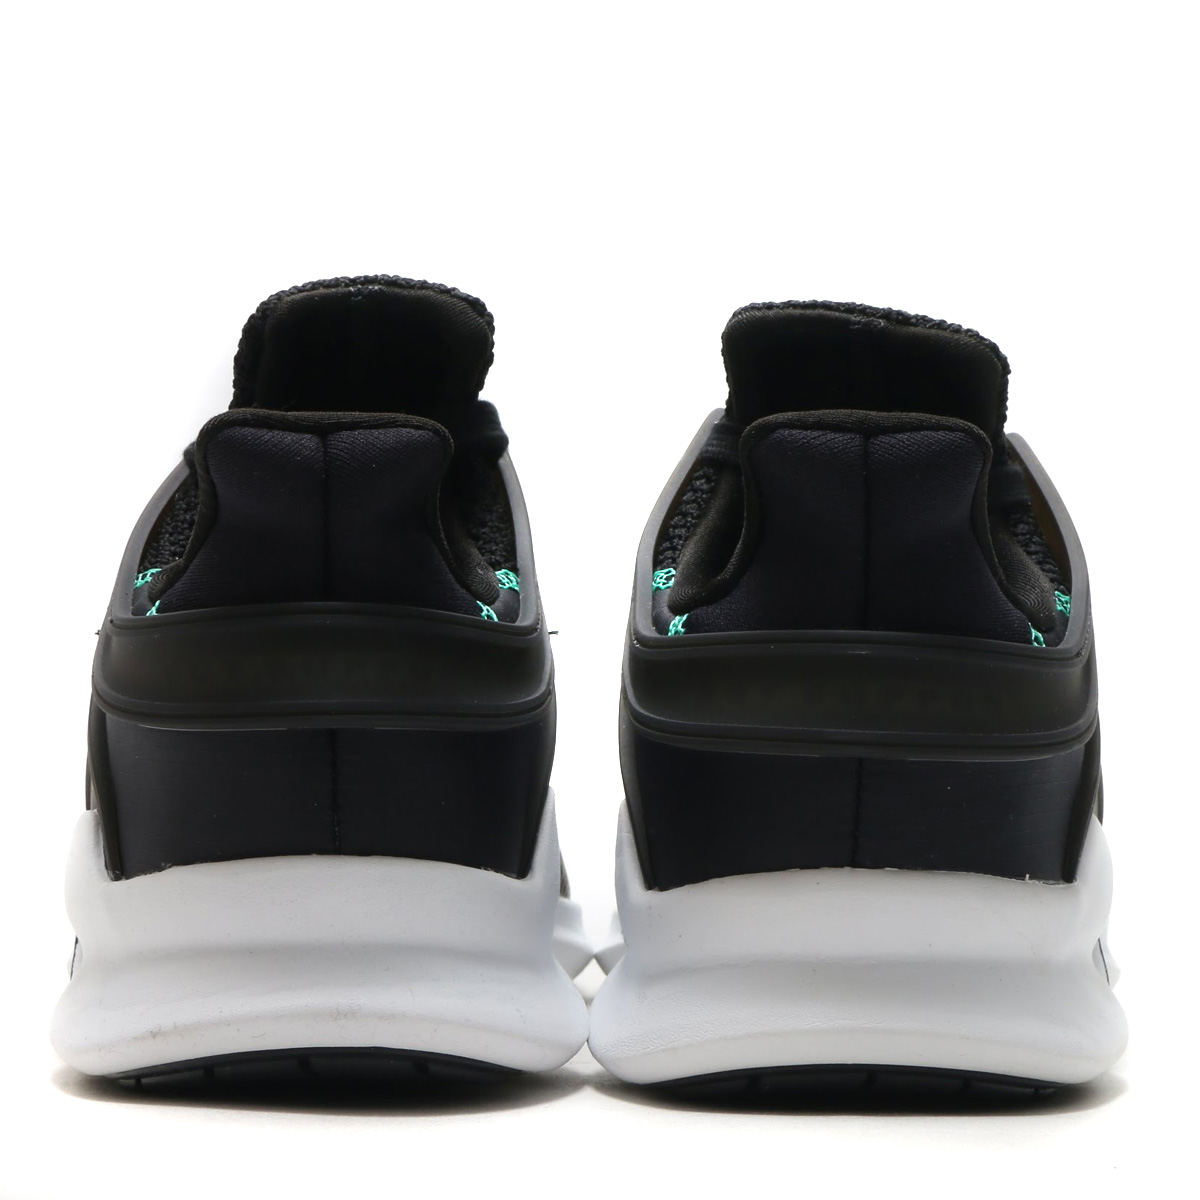 the best attitude cdcae 99218 adidas Originals EQT SUPPORT ADV (Adidas originals E cue tea support ADV) Core  BlackCore BlackFtwr White 18SP-I